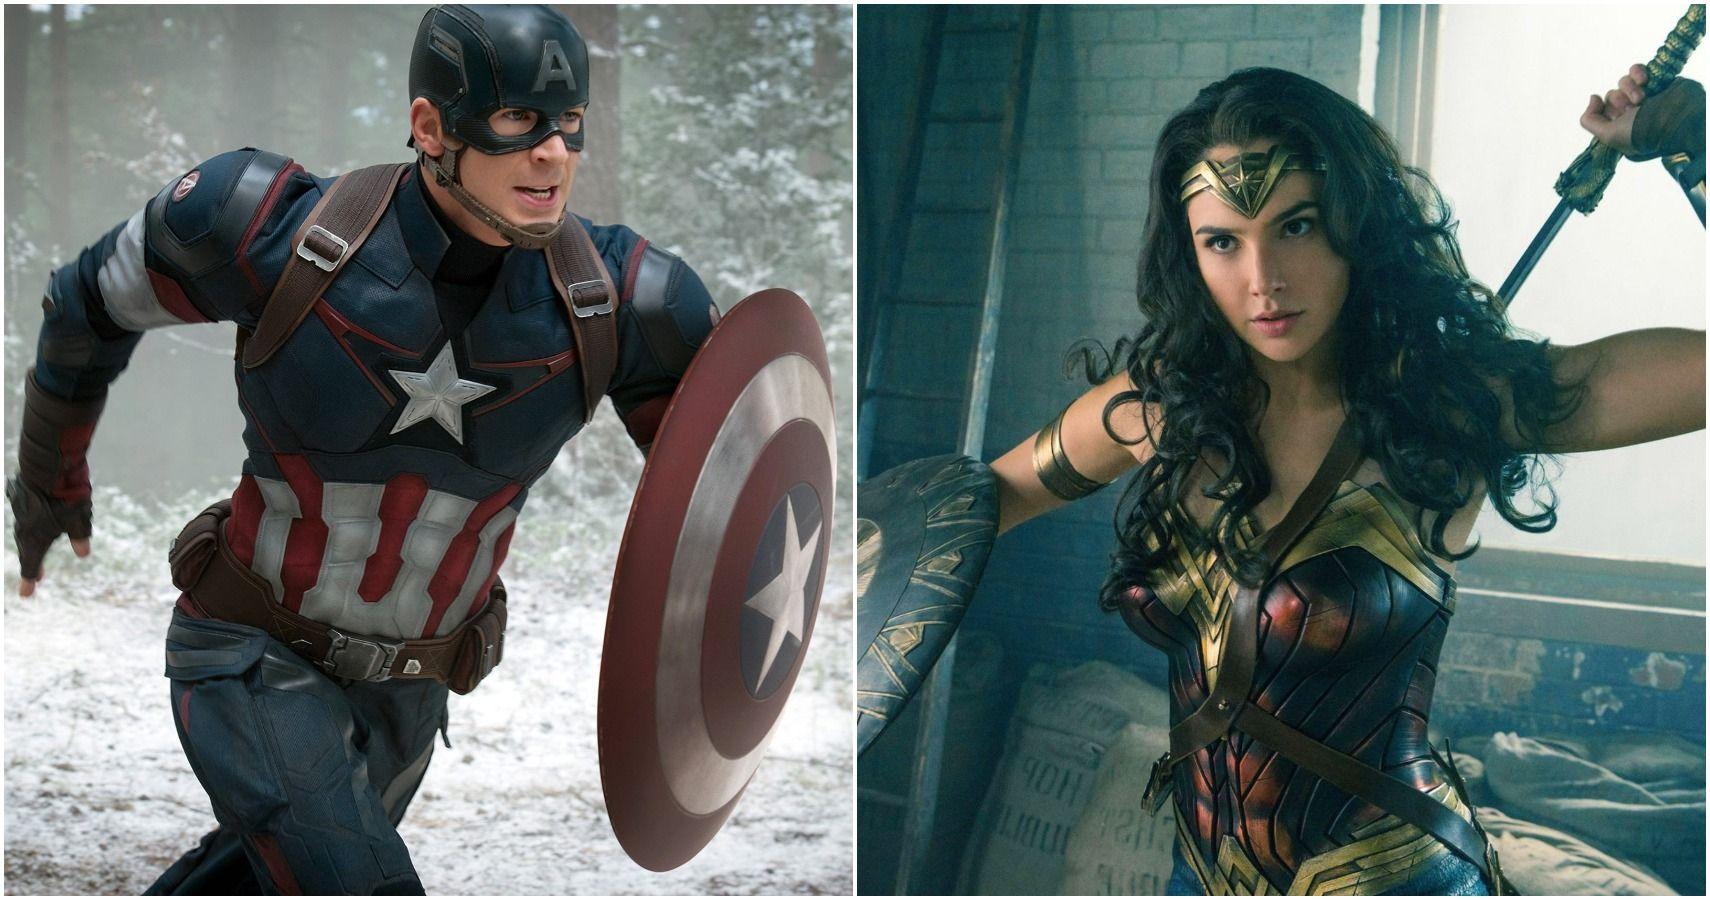 captain-america-vs-wonder-woman-feature.jpg